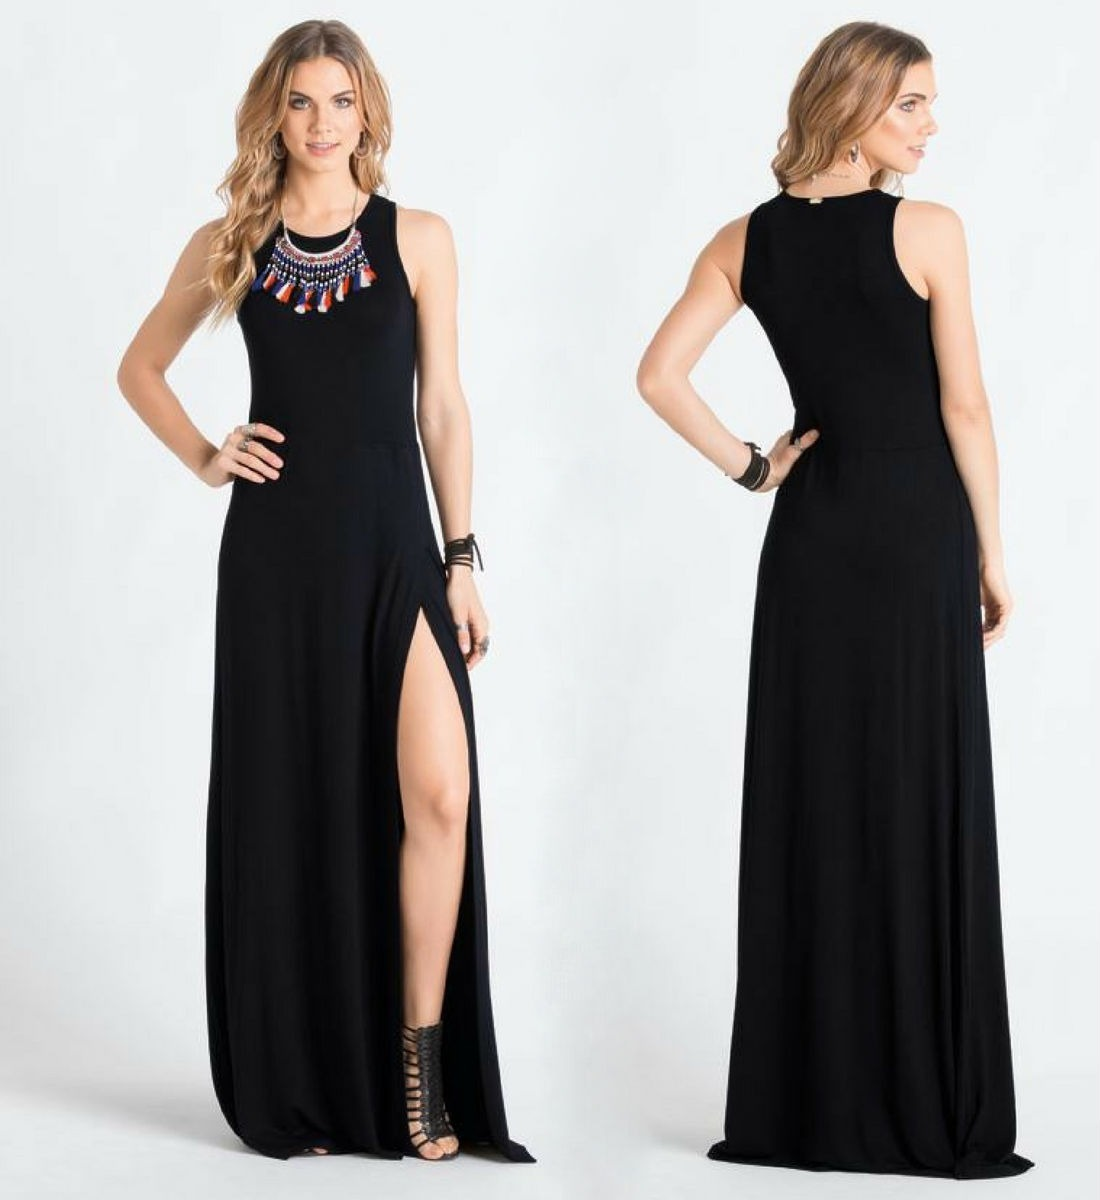 Vestido Longo Com Fenda Festa Preto Tubinho Casual Elegante